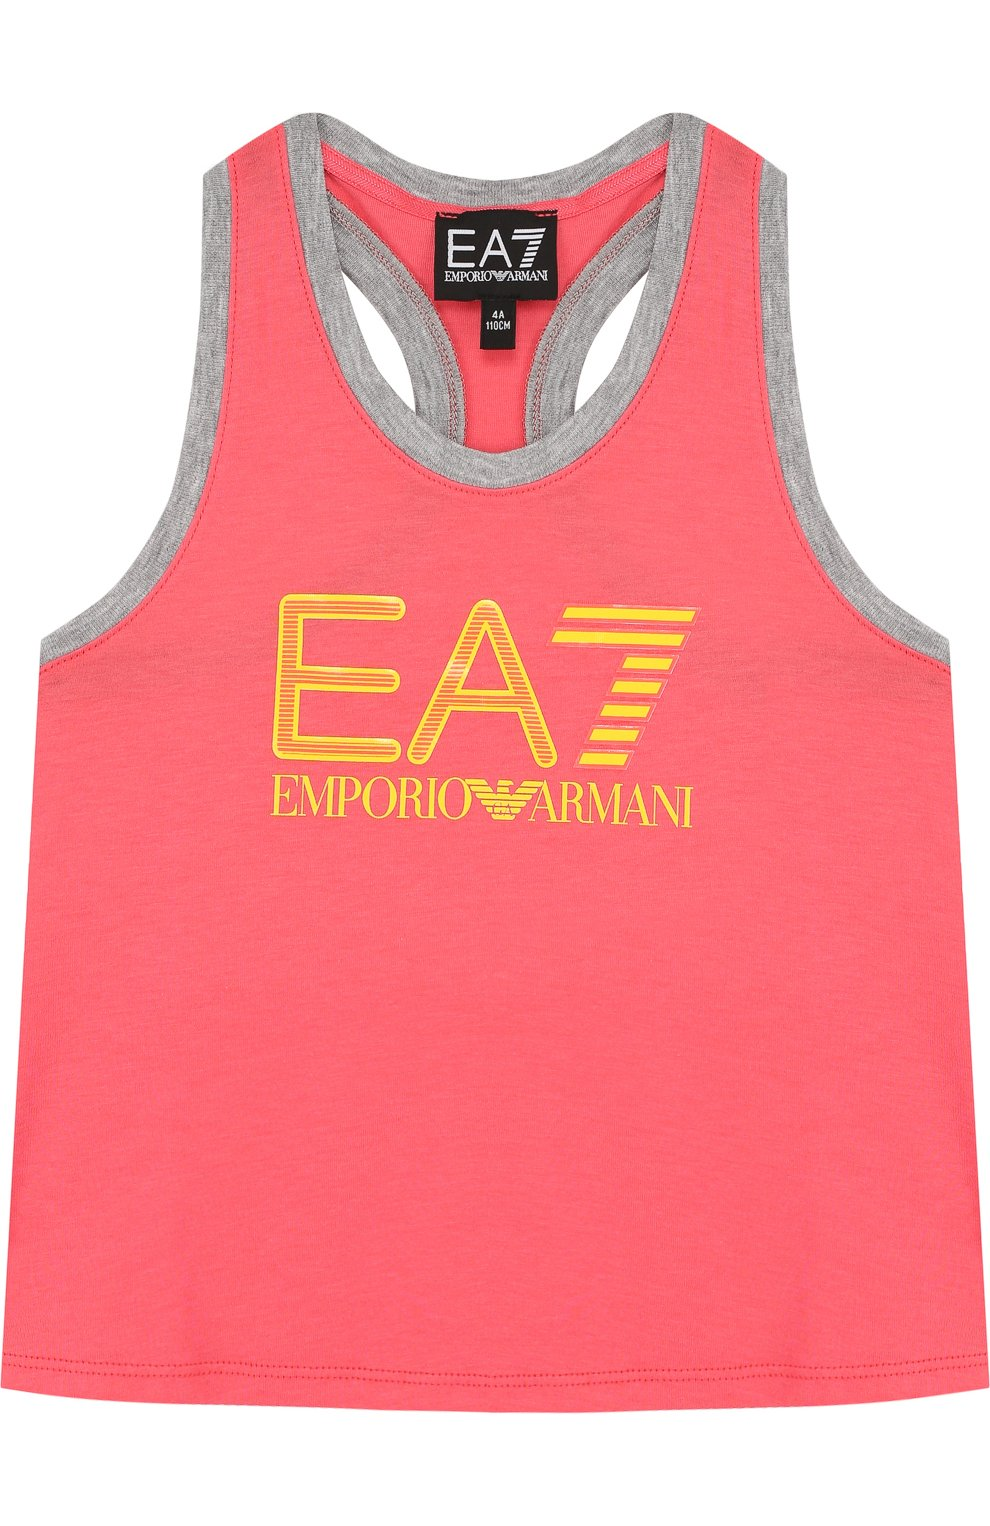 Детский хлопковая майка с логотипом бренда EA 7 розового цвета, арт. 3ZFH51/FJ22Z   Фото 1